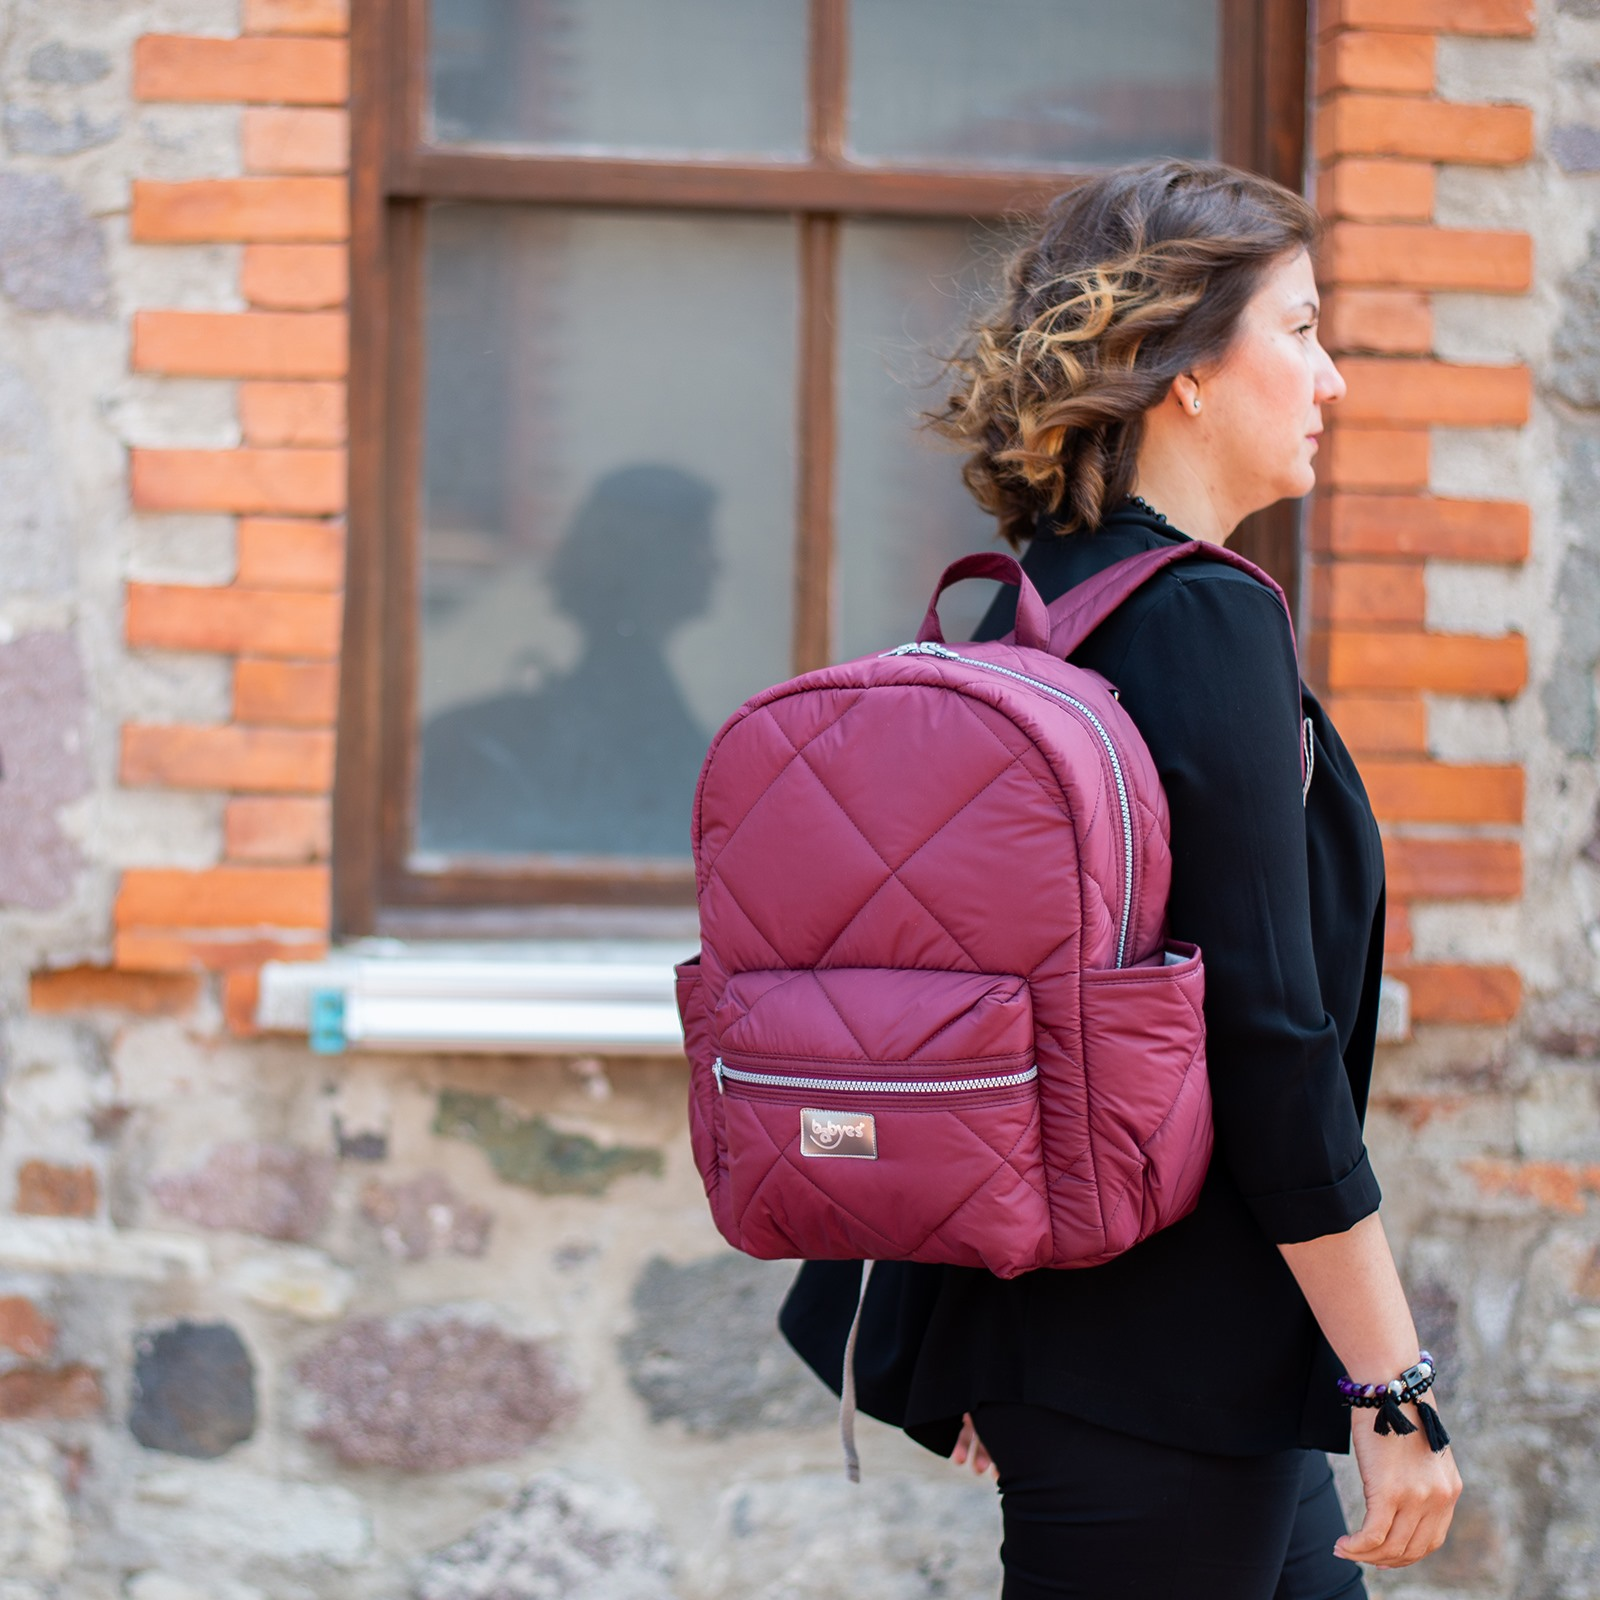 Ebebek Babyes Pobby Backpack